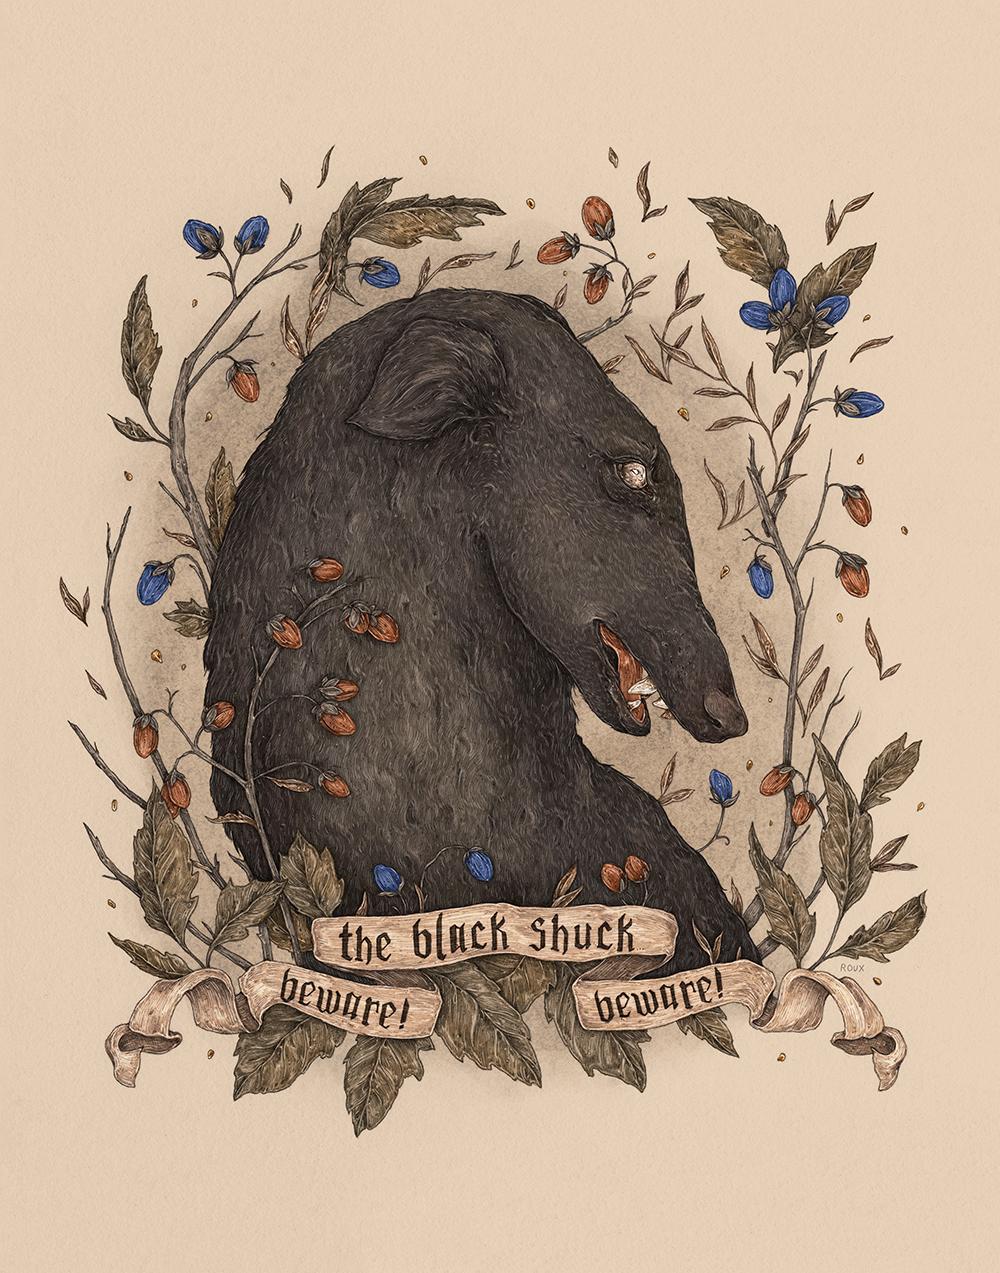 """Beware, The Black Shuck"" by Jessica Roux"